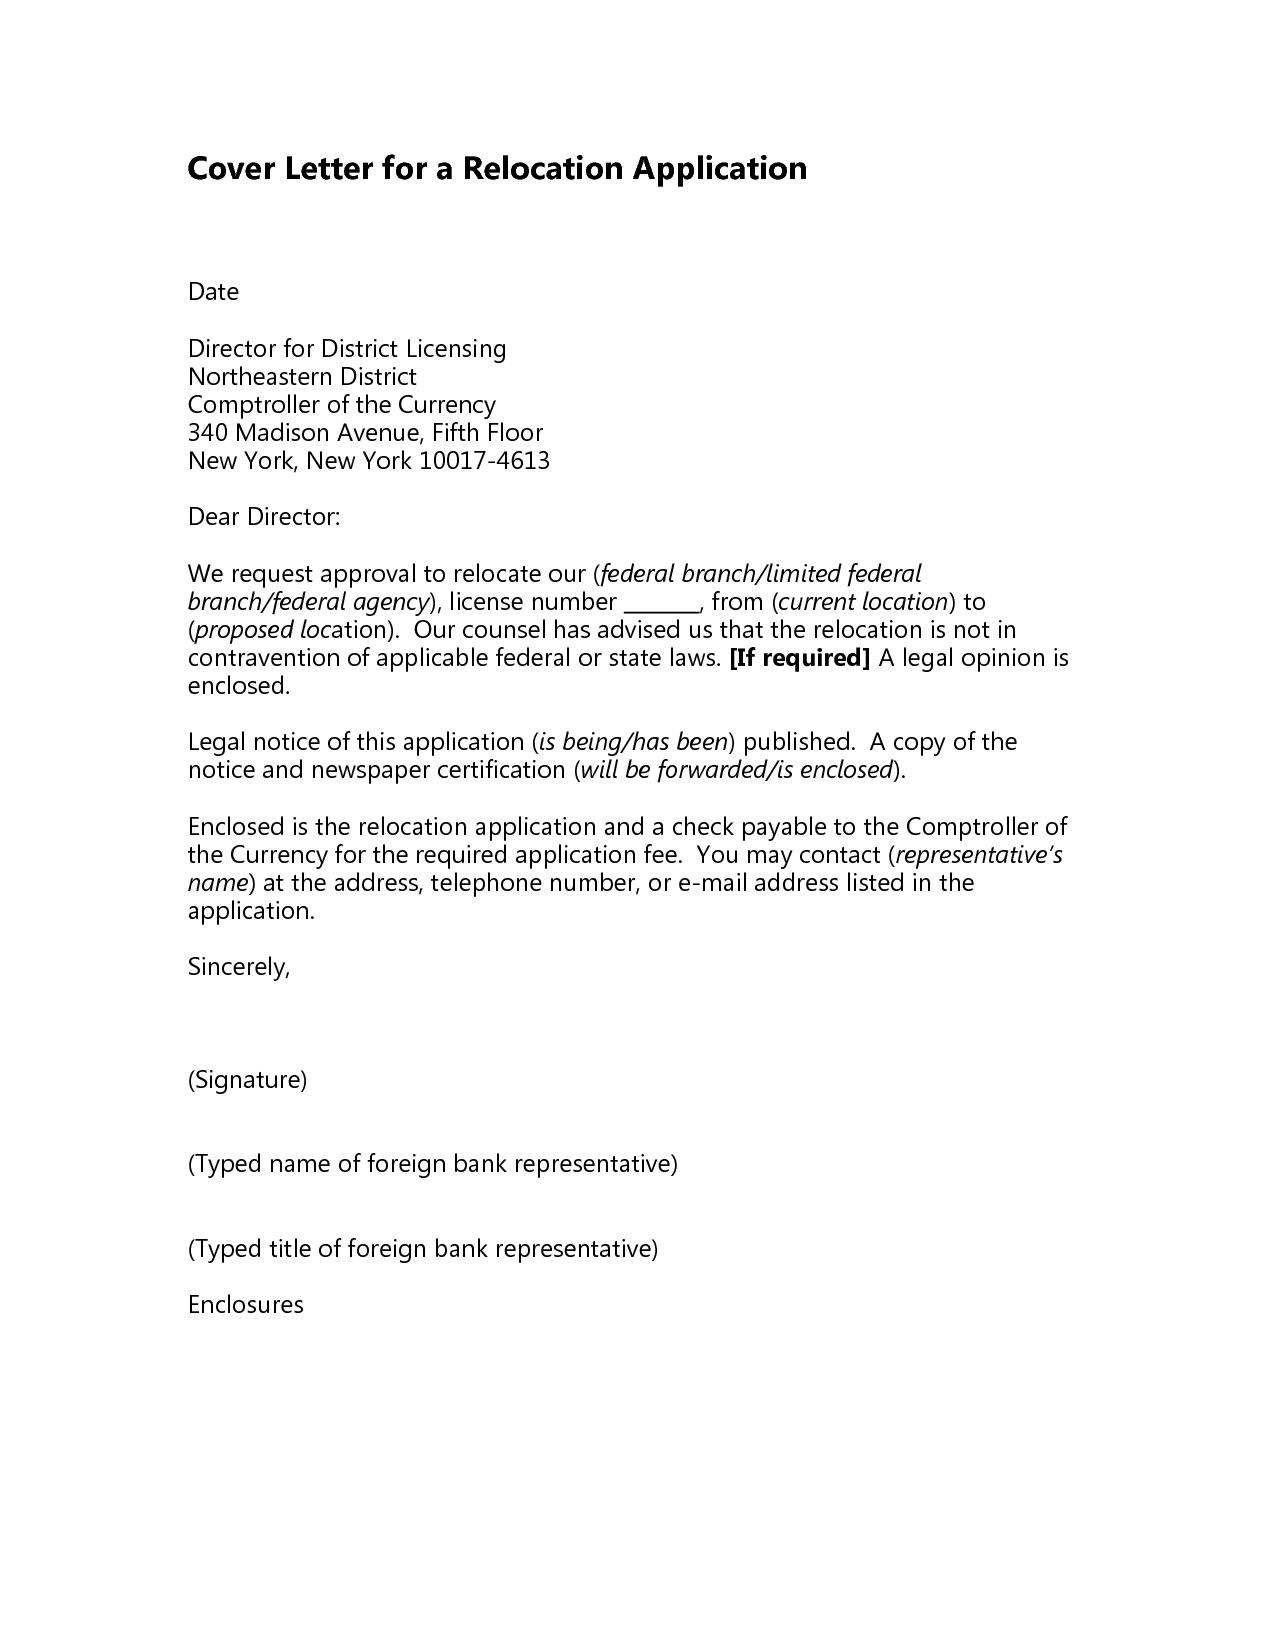 Letter Stating RelocationRelocation Cover Letter Cover Letter